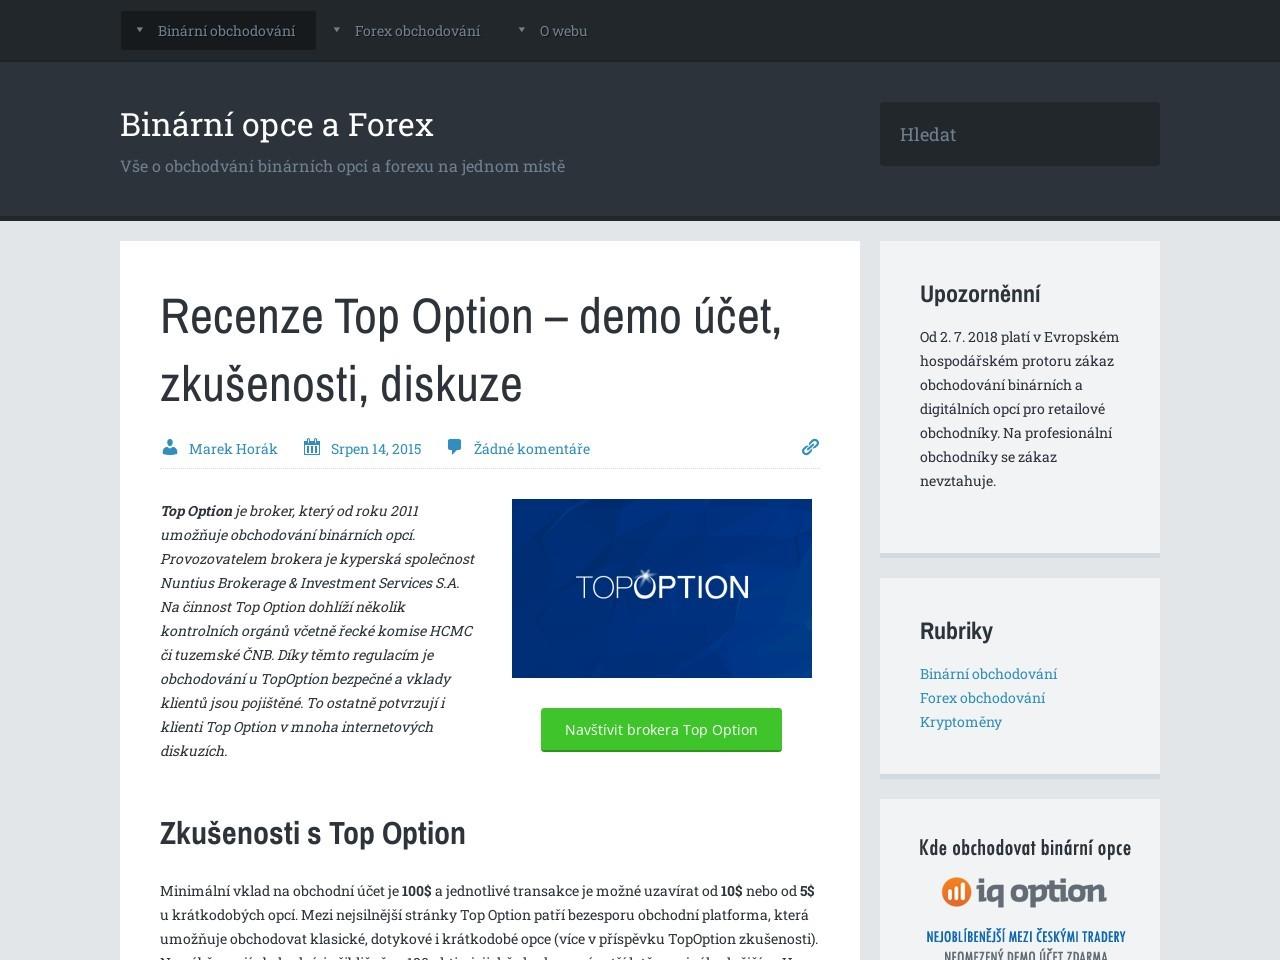 Recenze Top Option – demo účet, zkušenosti, diskuze (Zdroj: Wordpress.com)